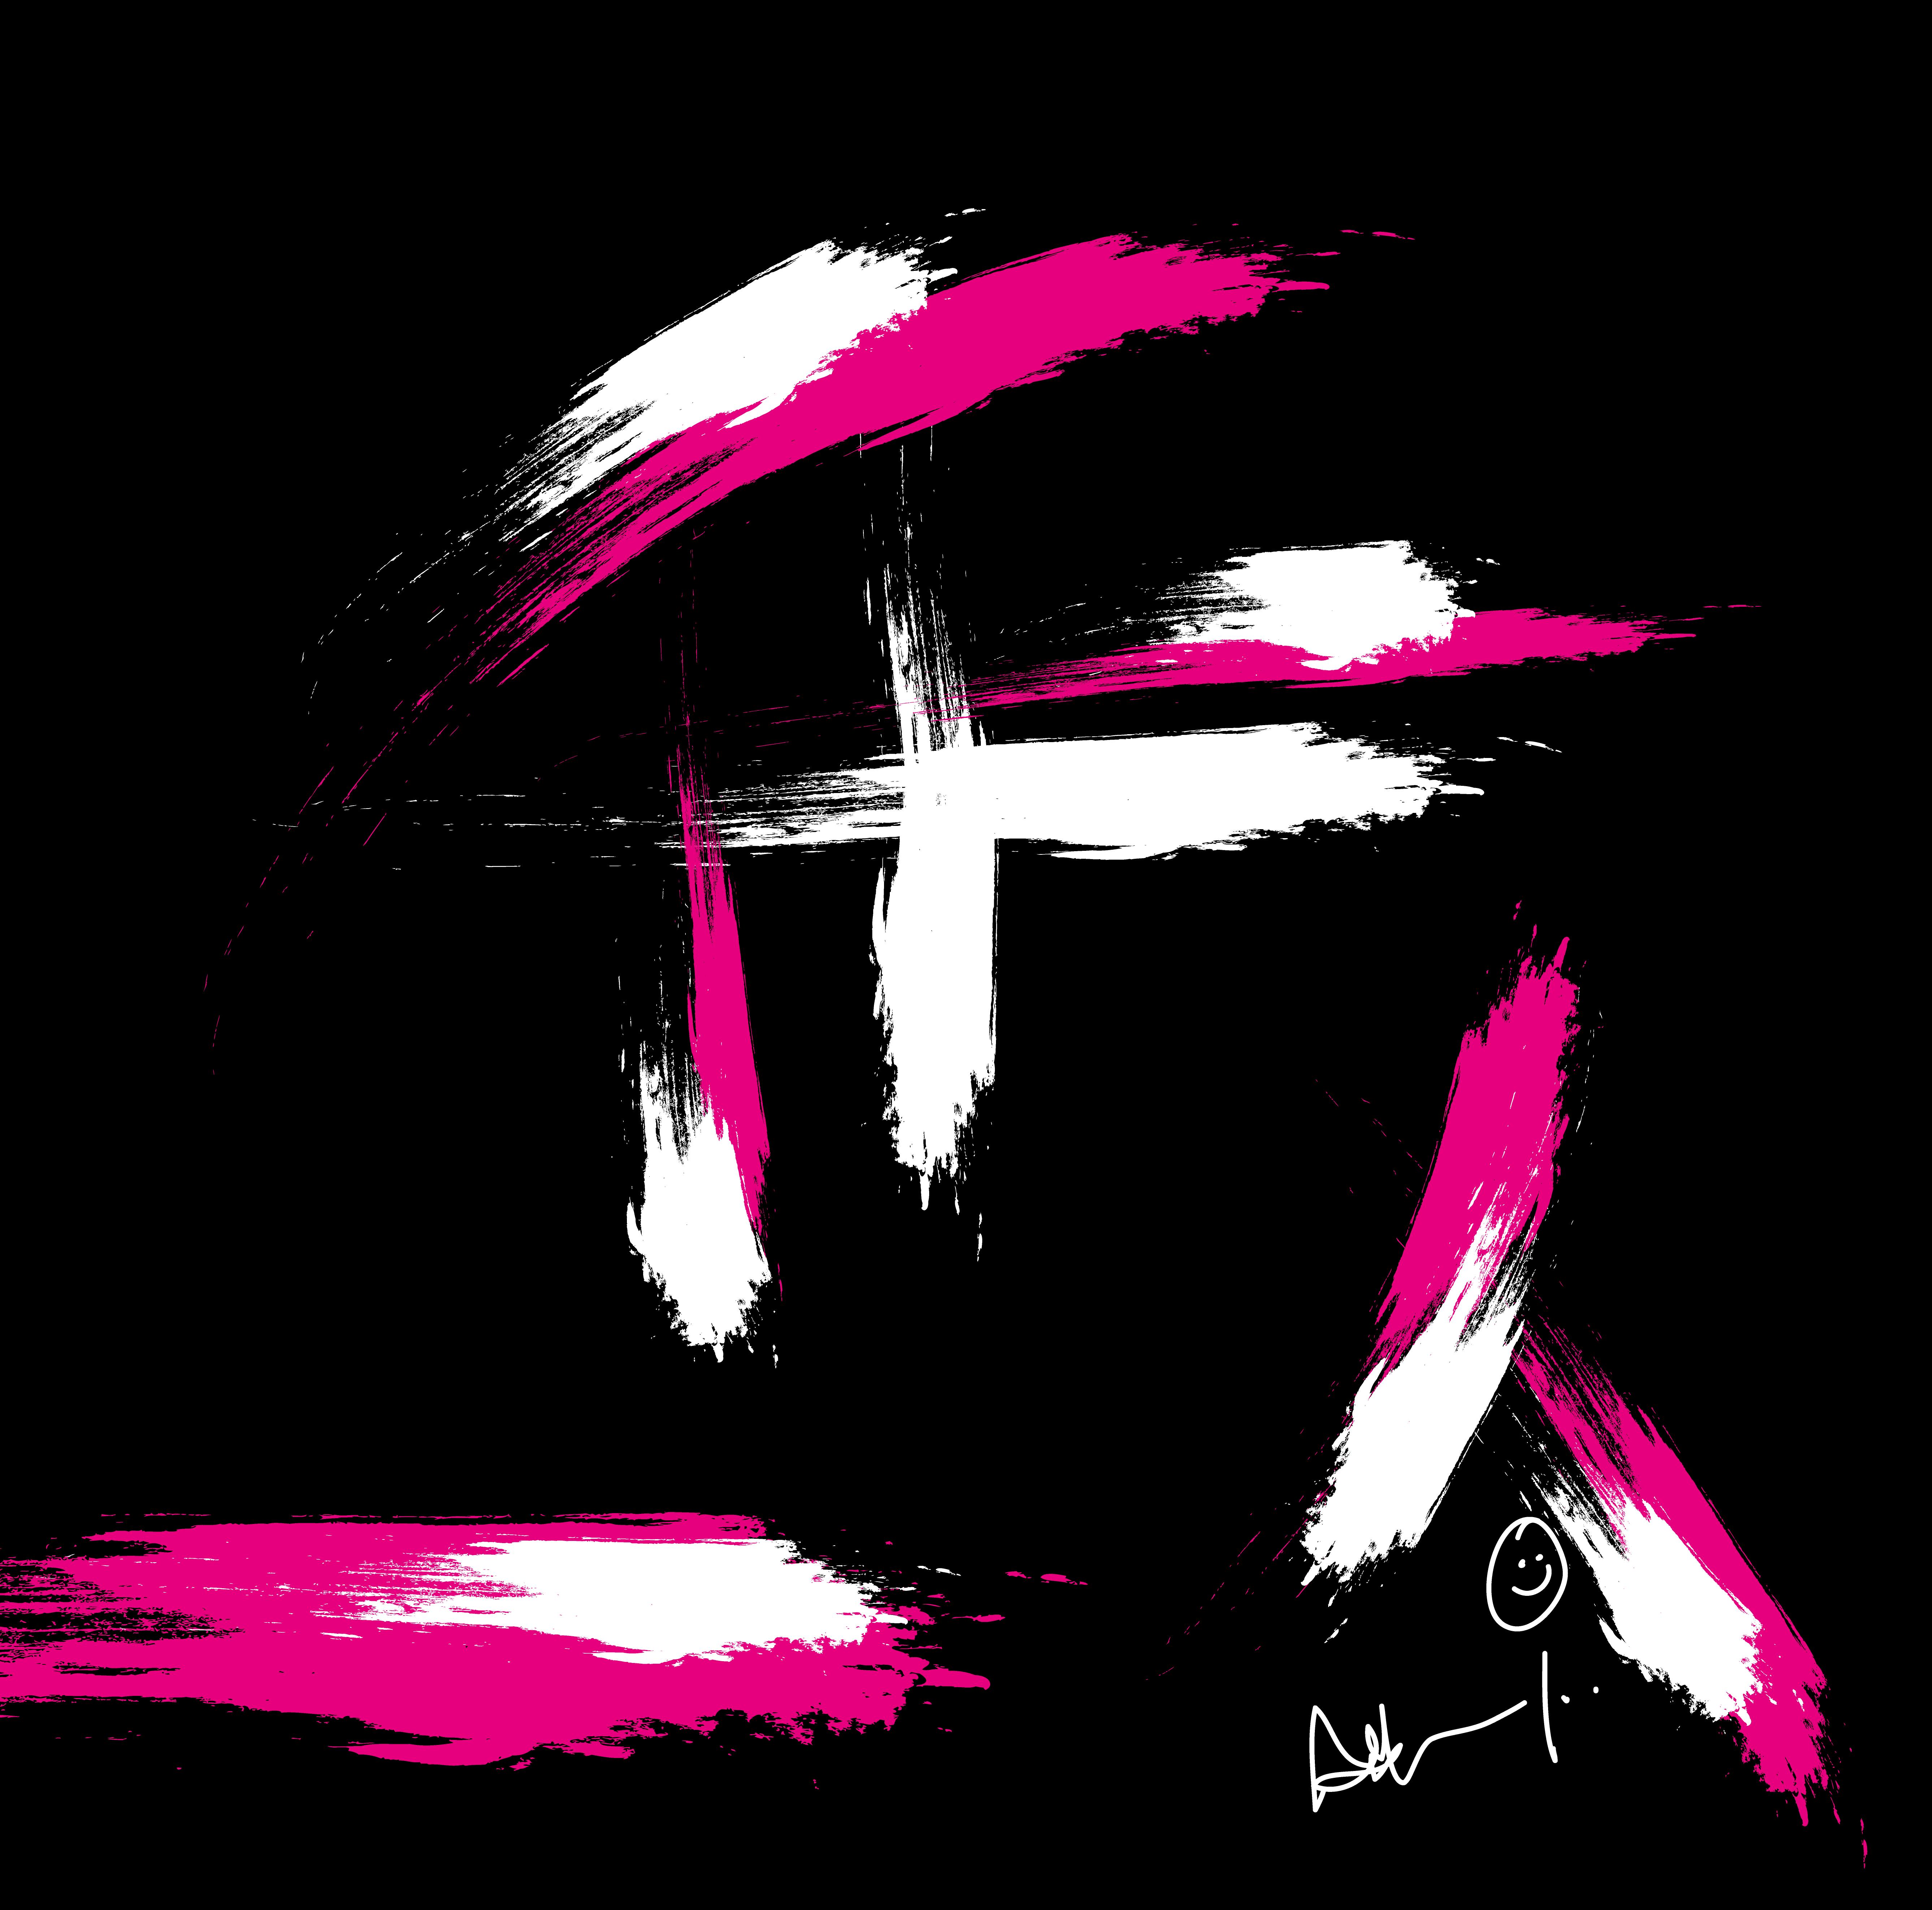 pink on black-01